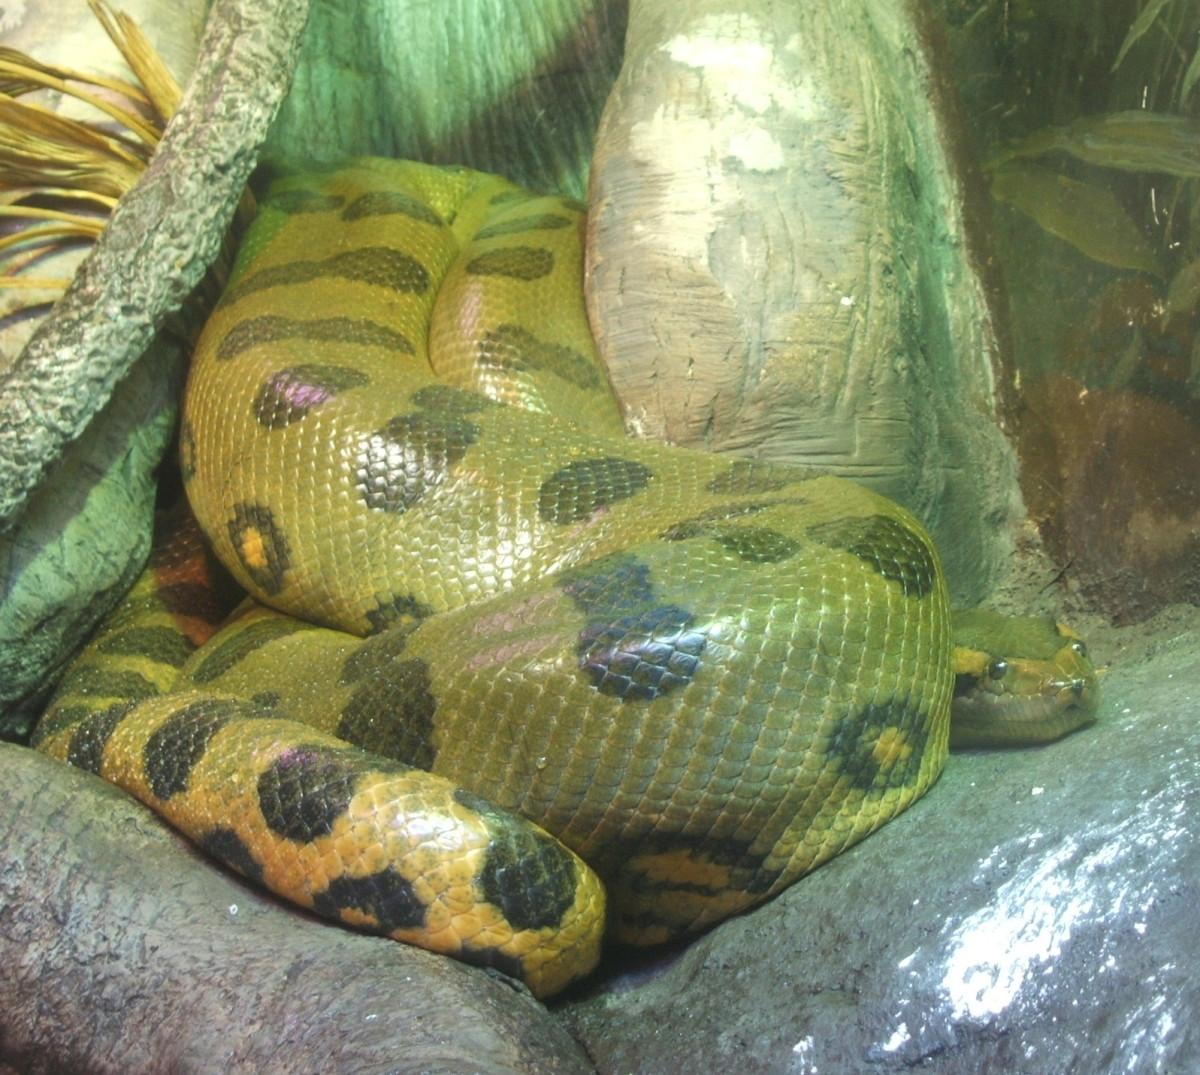 Anaconda Snake Facts | Different Types of Anacondas